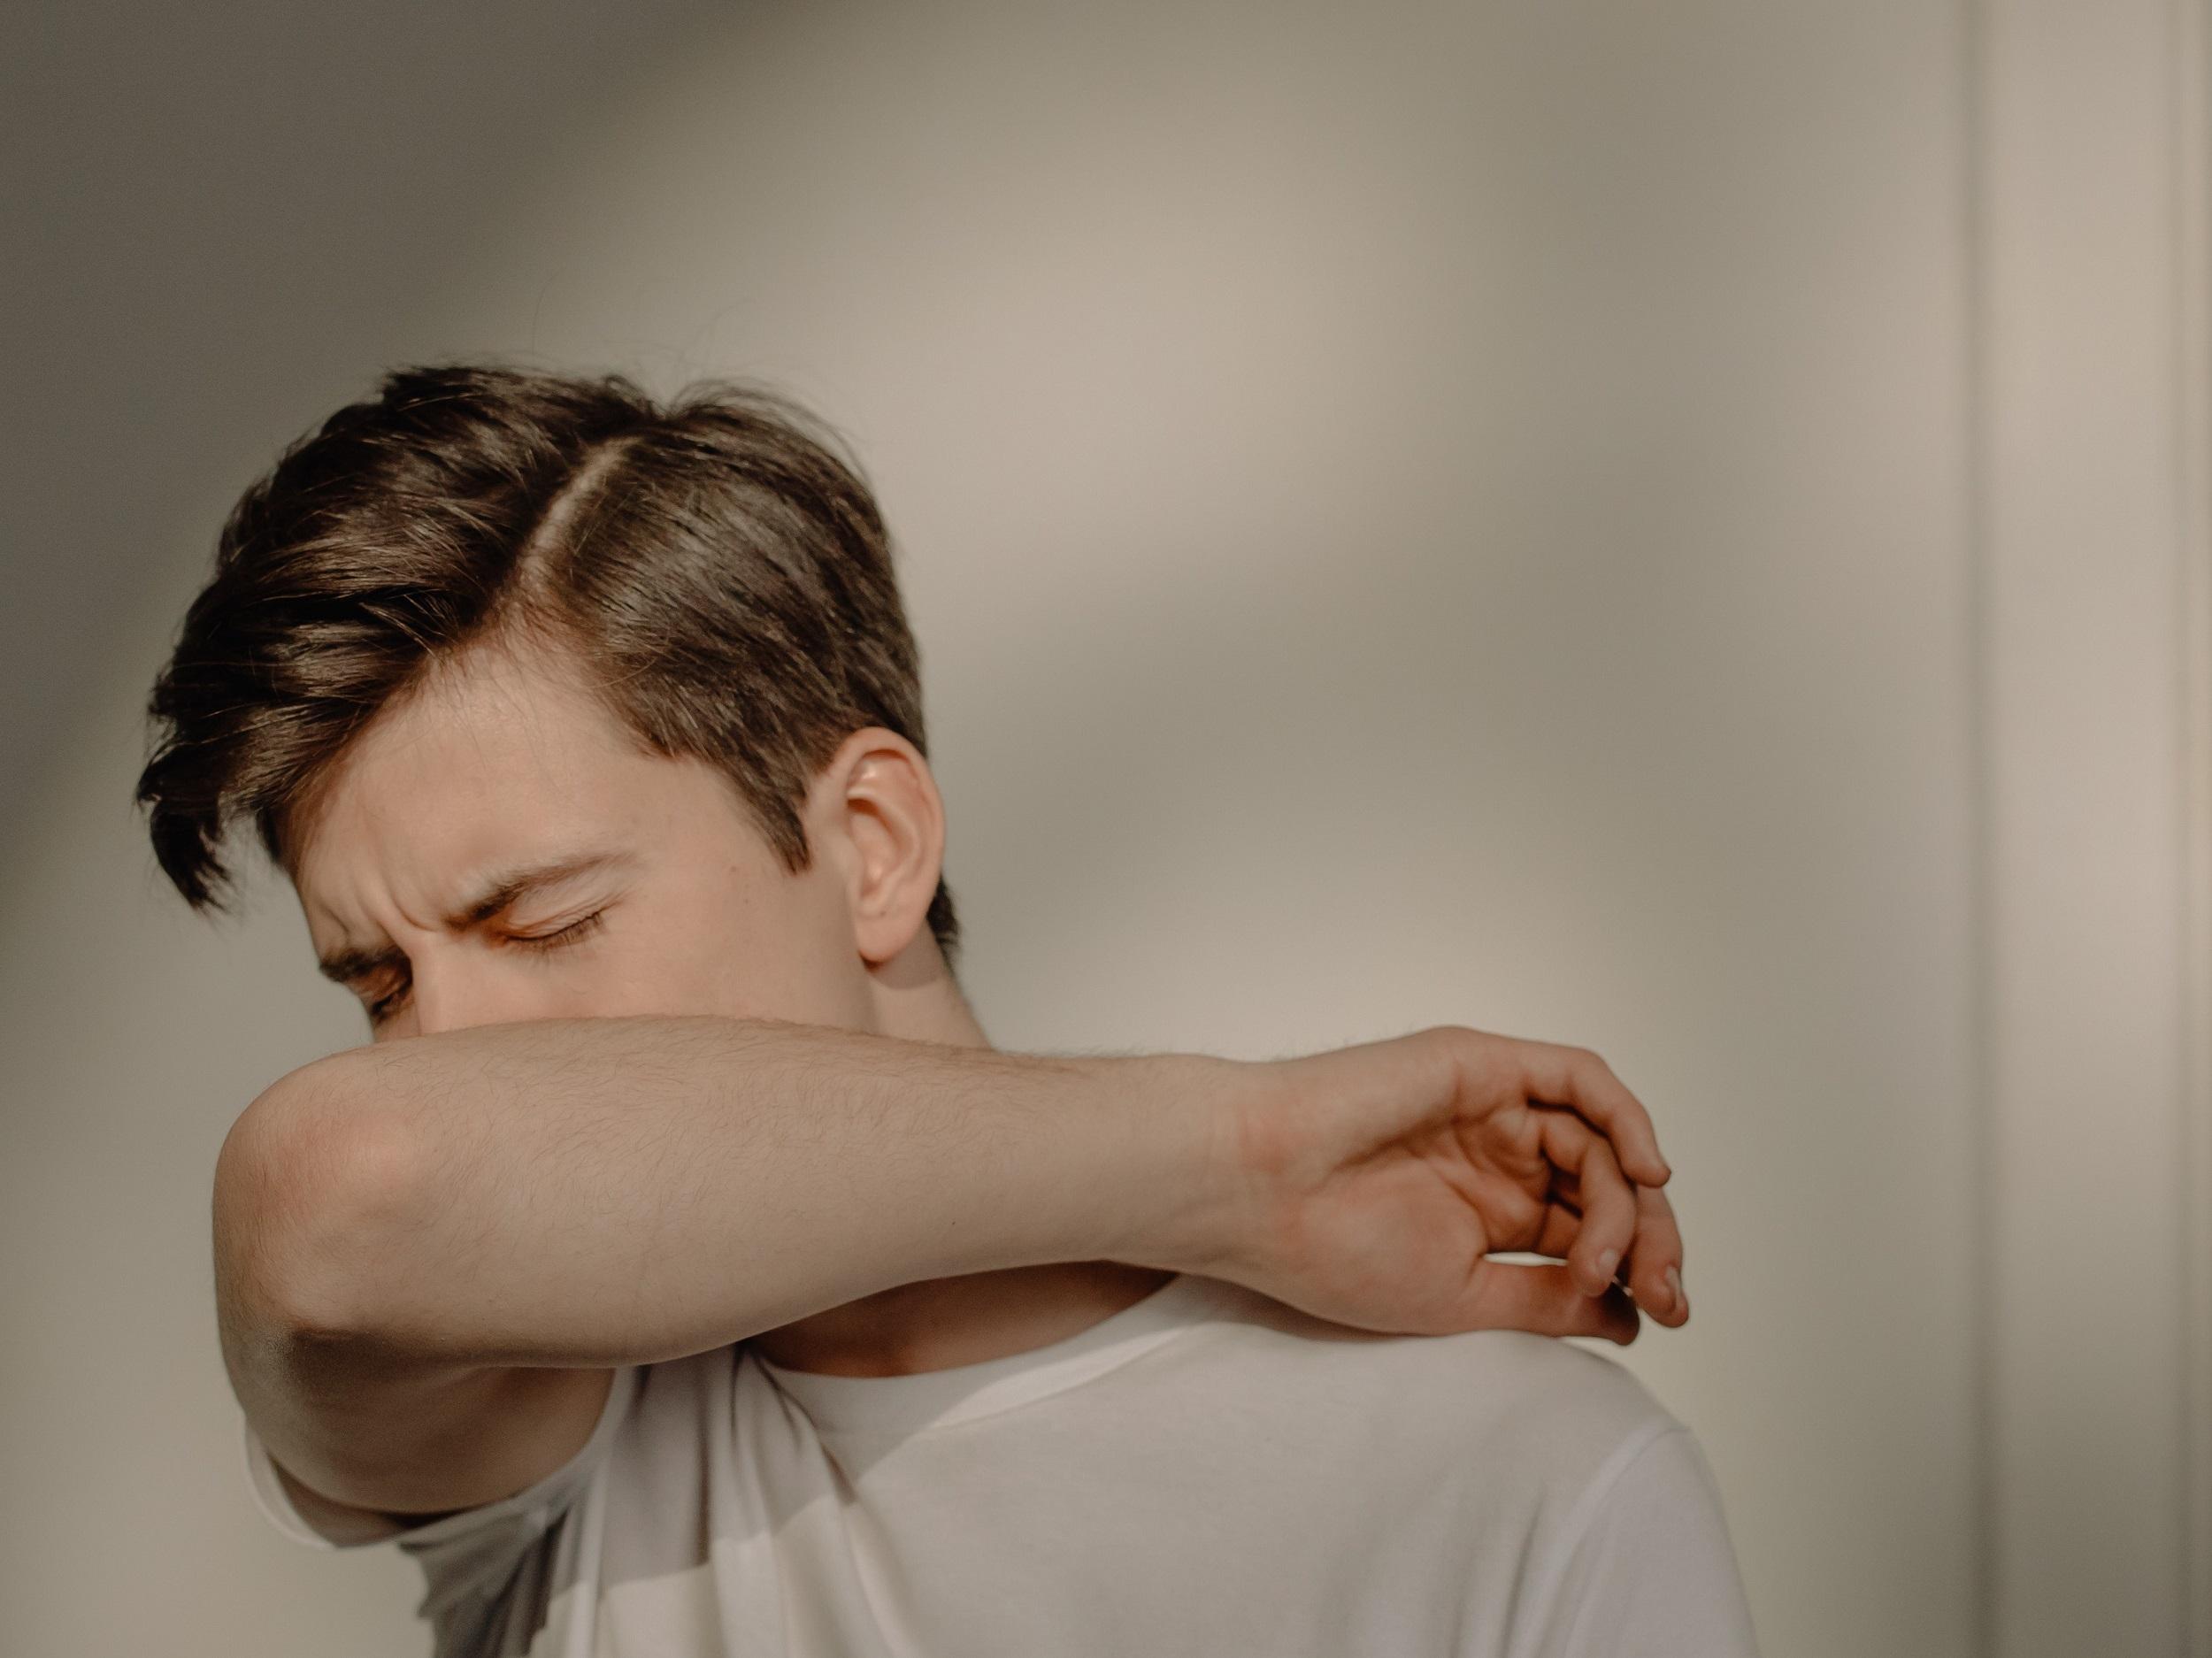 man sneezing into his elbow